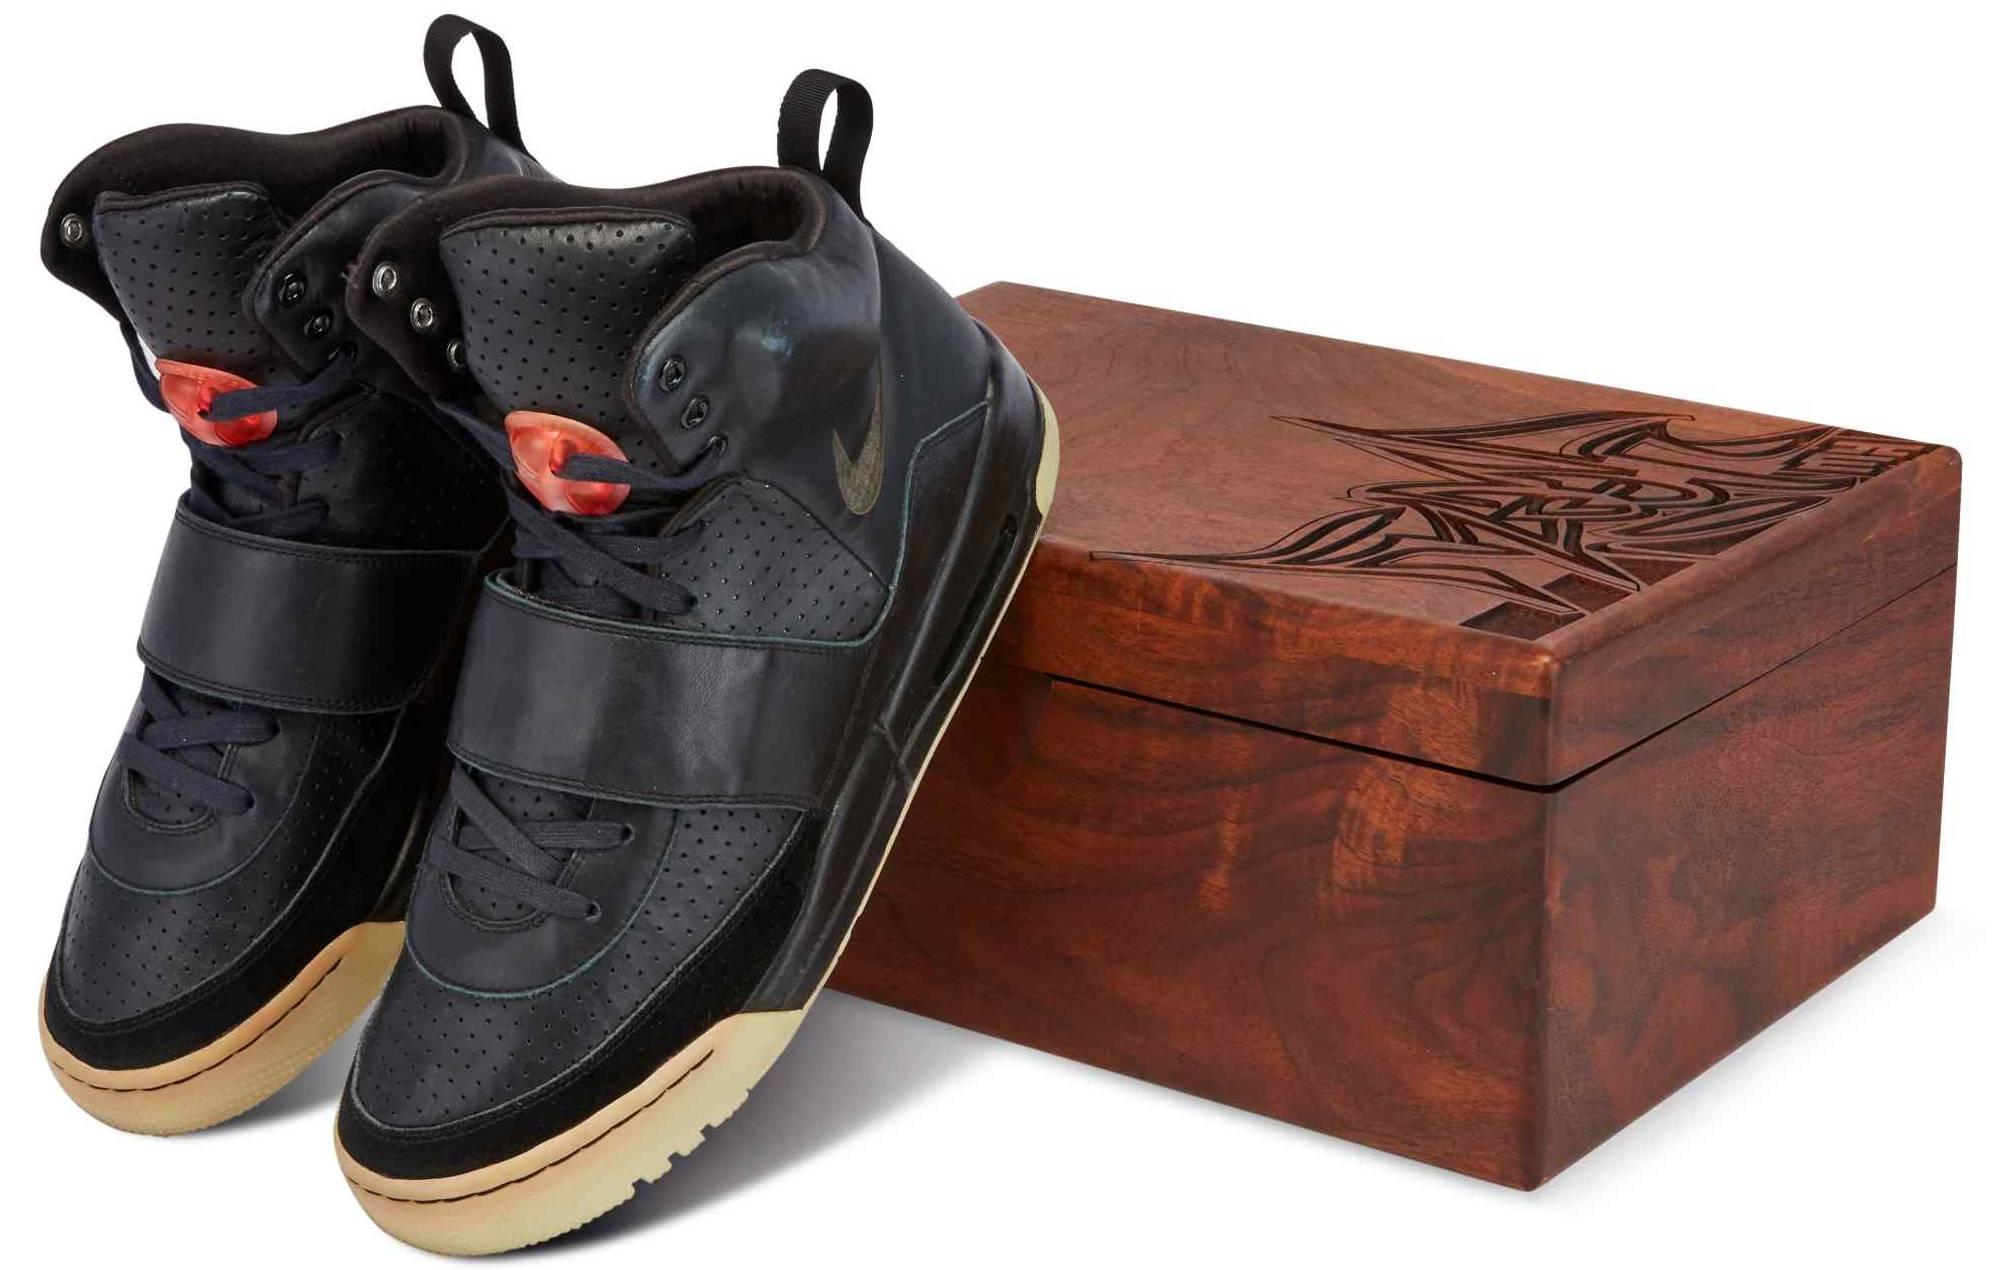 Kanye West's Yeezy shoe prototypes, valued at over $1 million, set to go up for sale